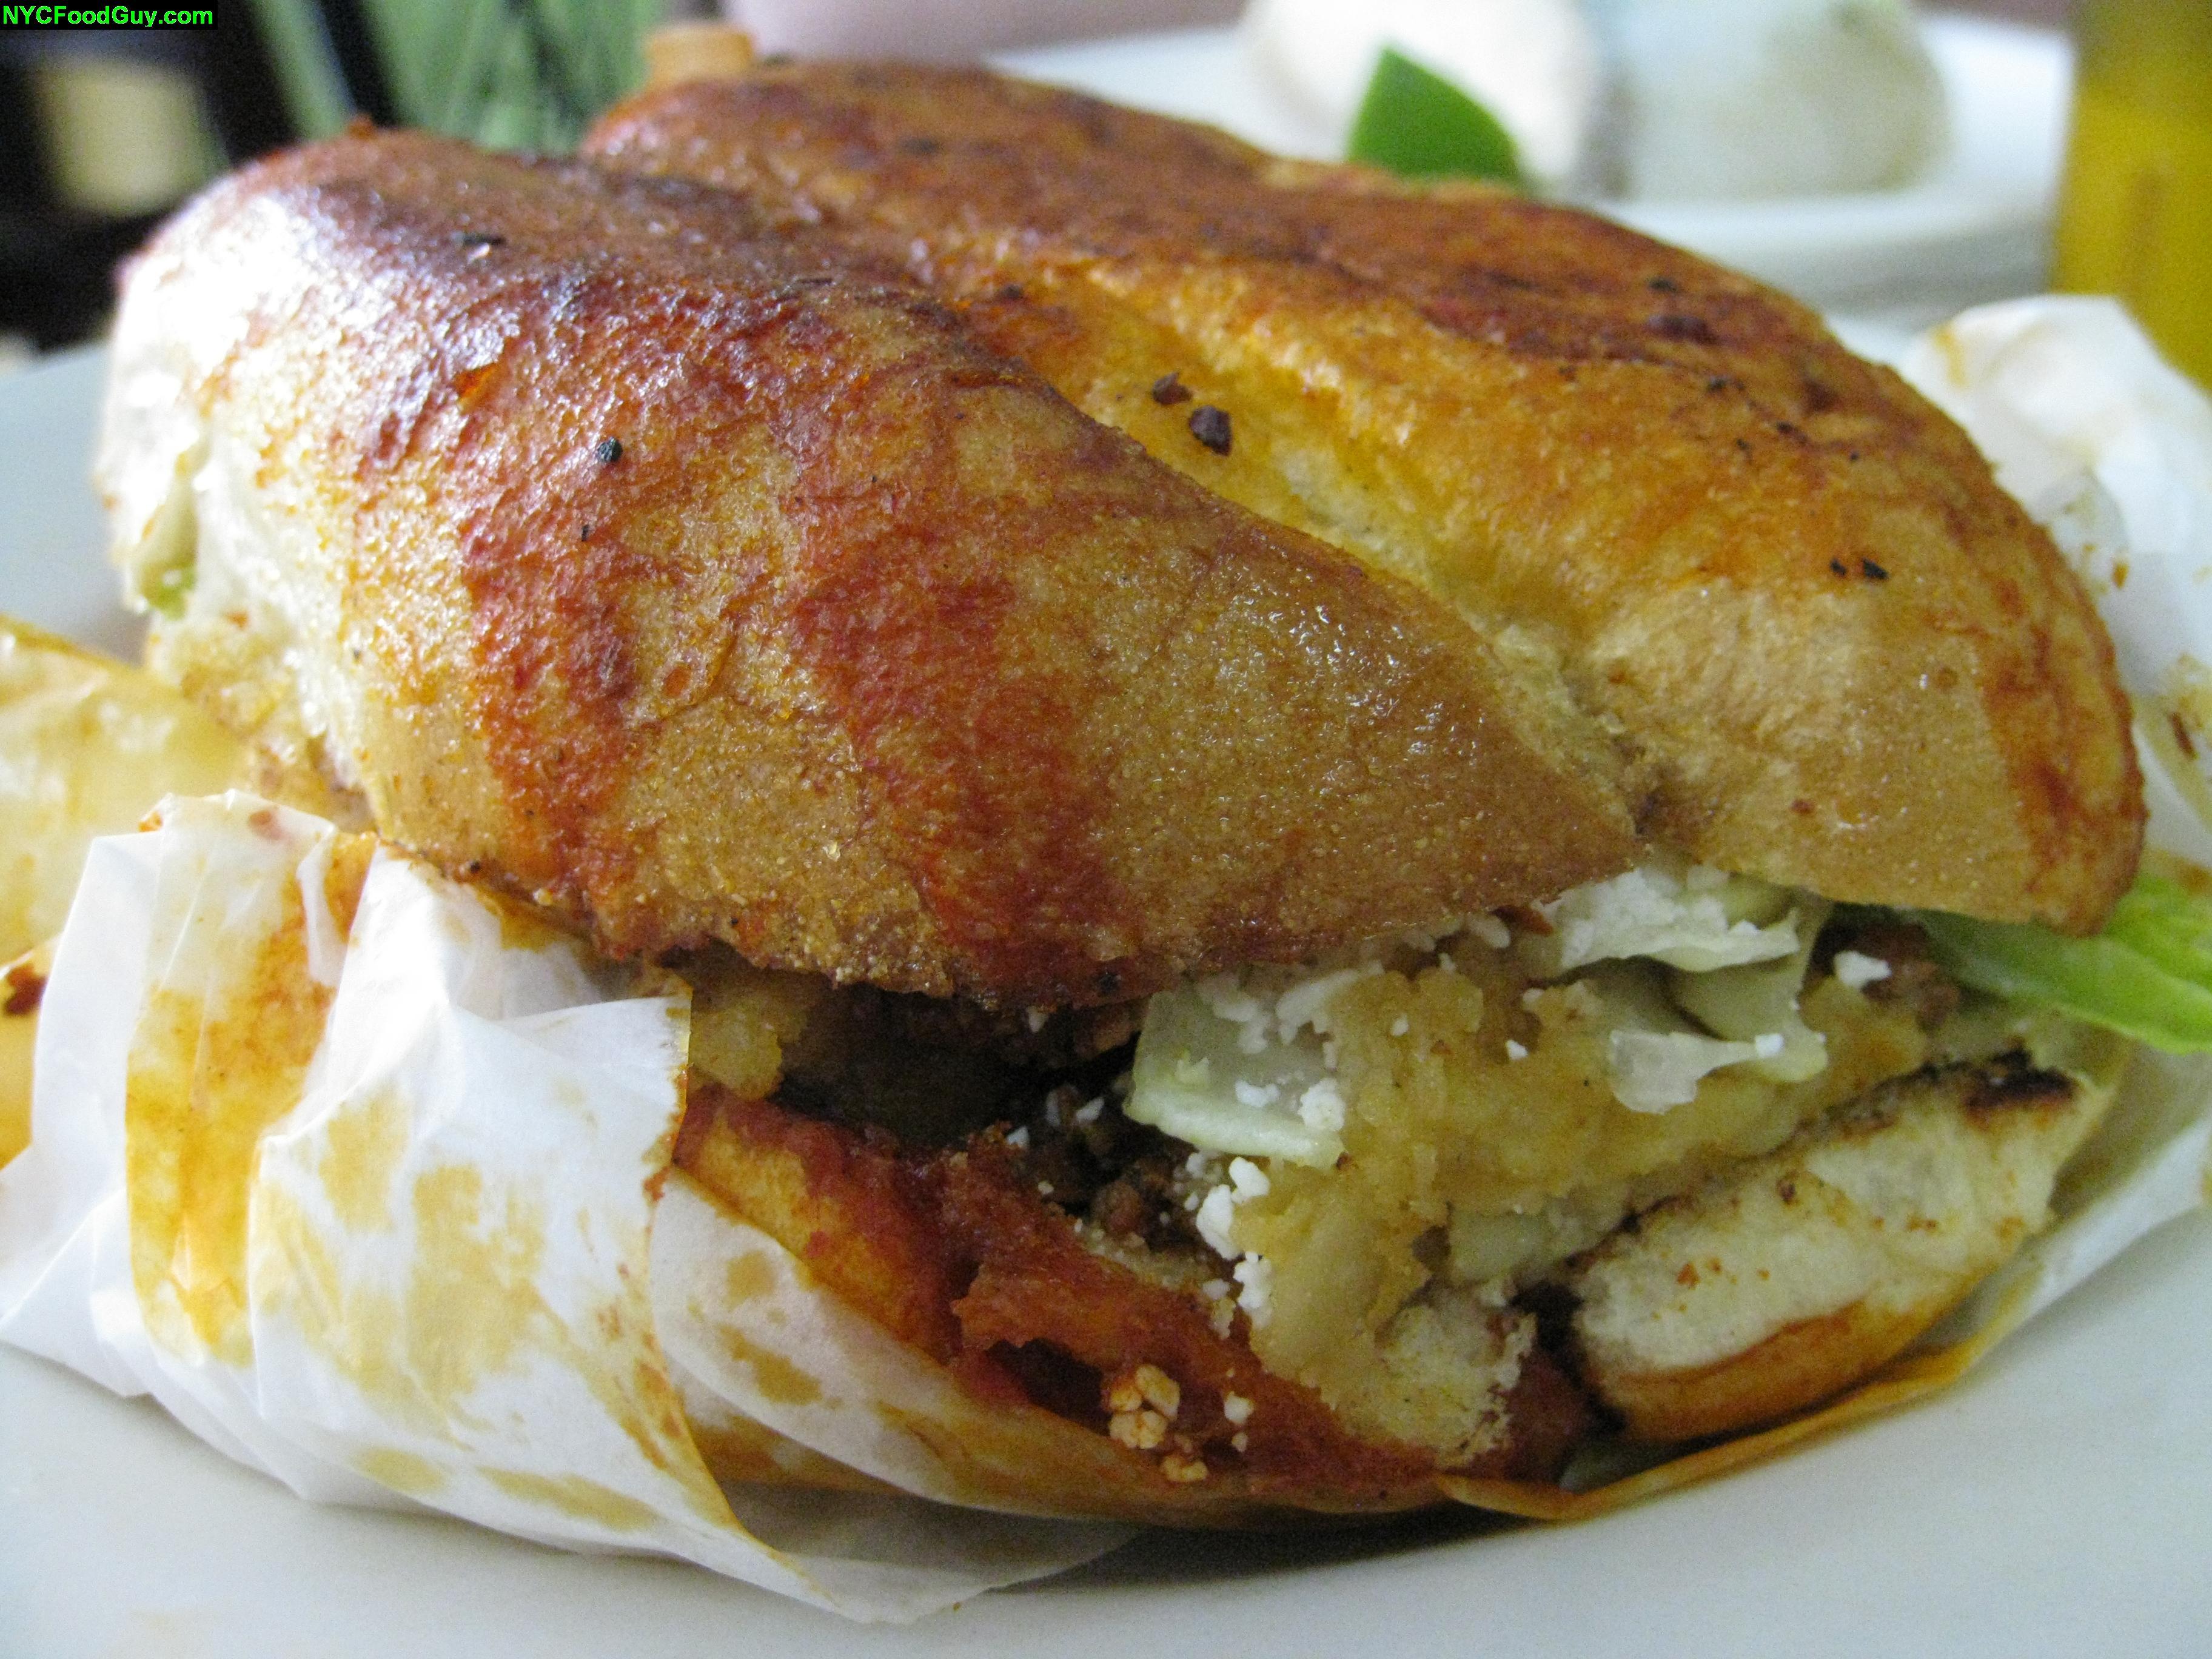 Pambazo ($6.00), a sandwich unlike any I've had before.